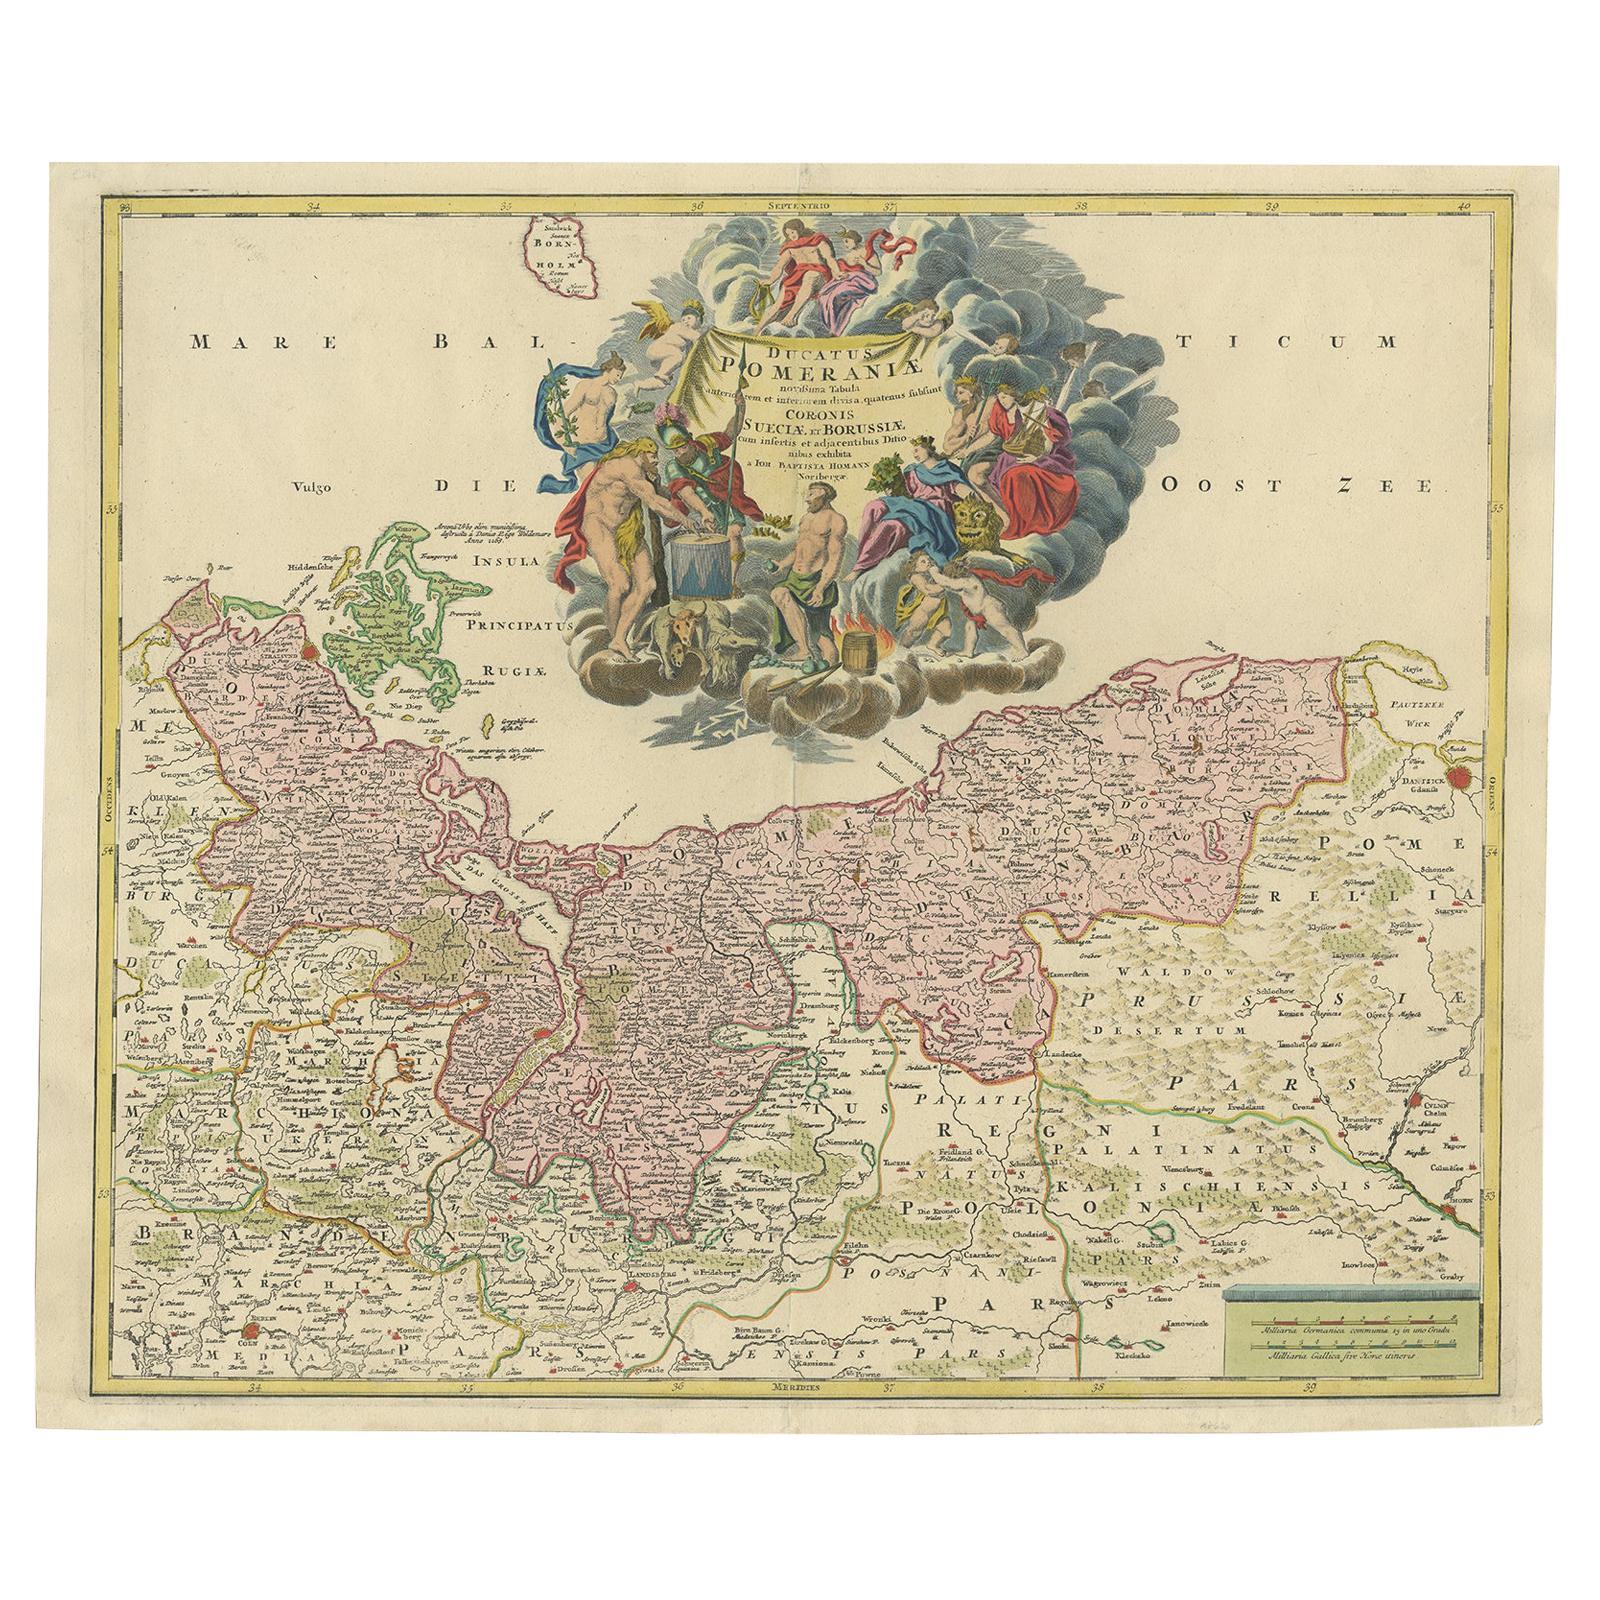 Antique Map of the Baltic Region by Homann 'circa 1710'